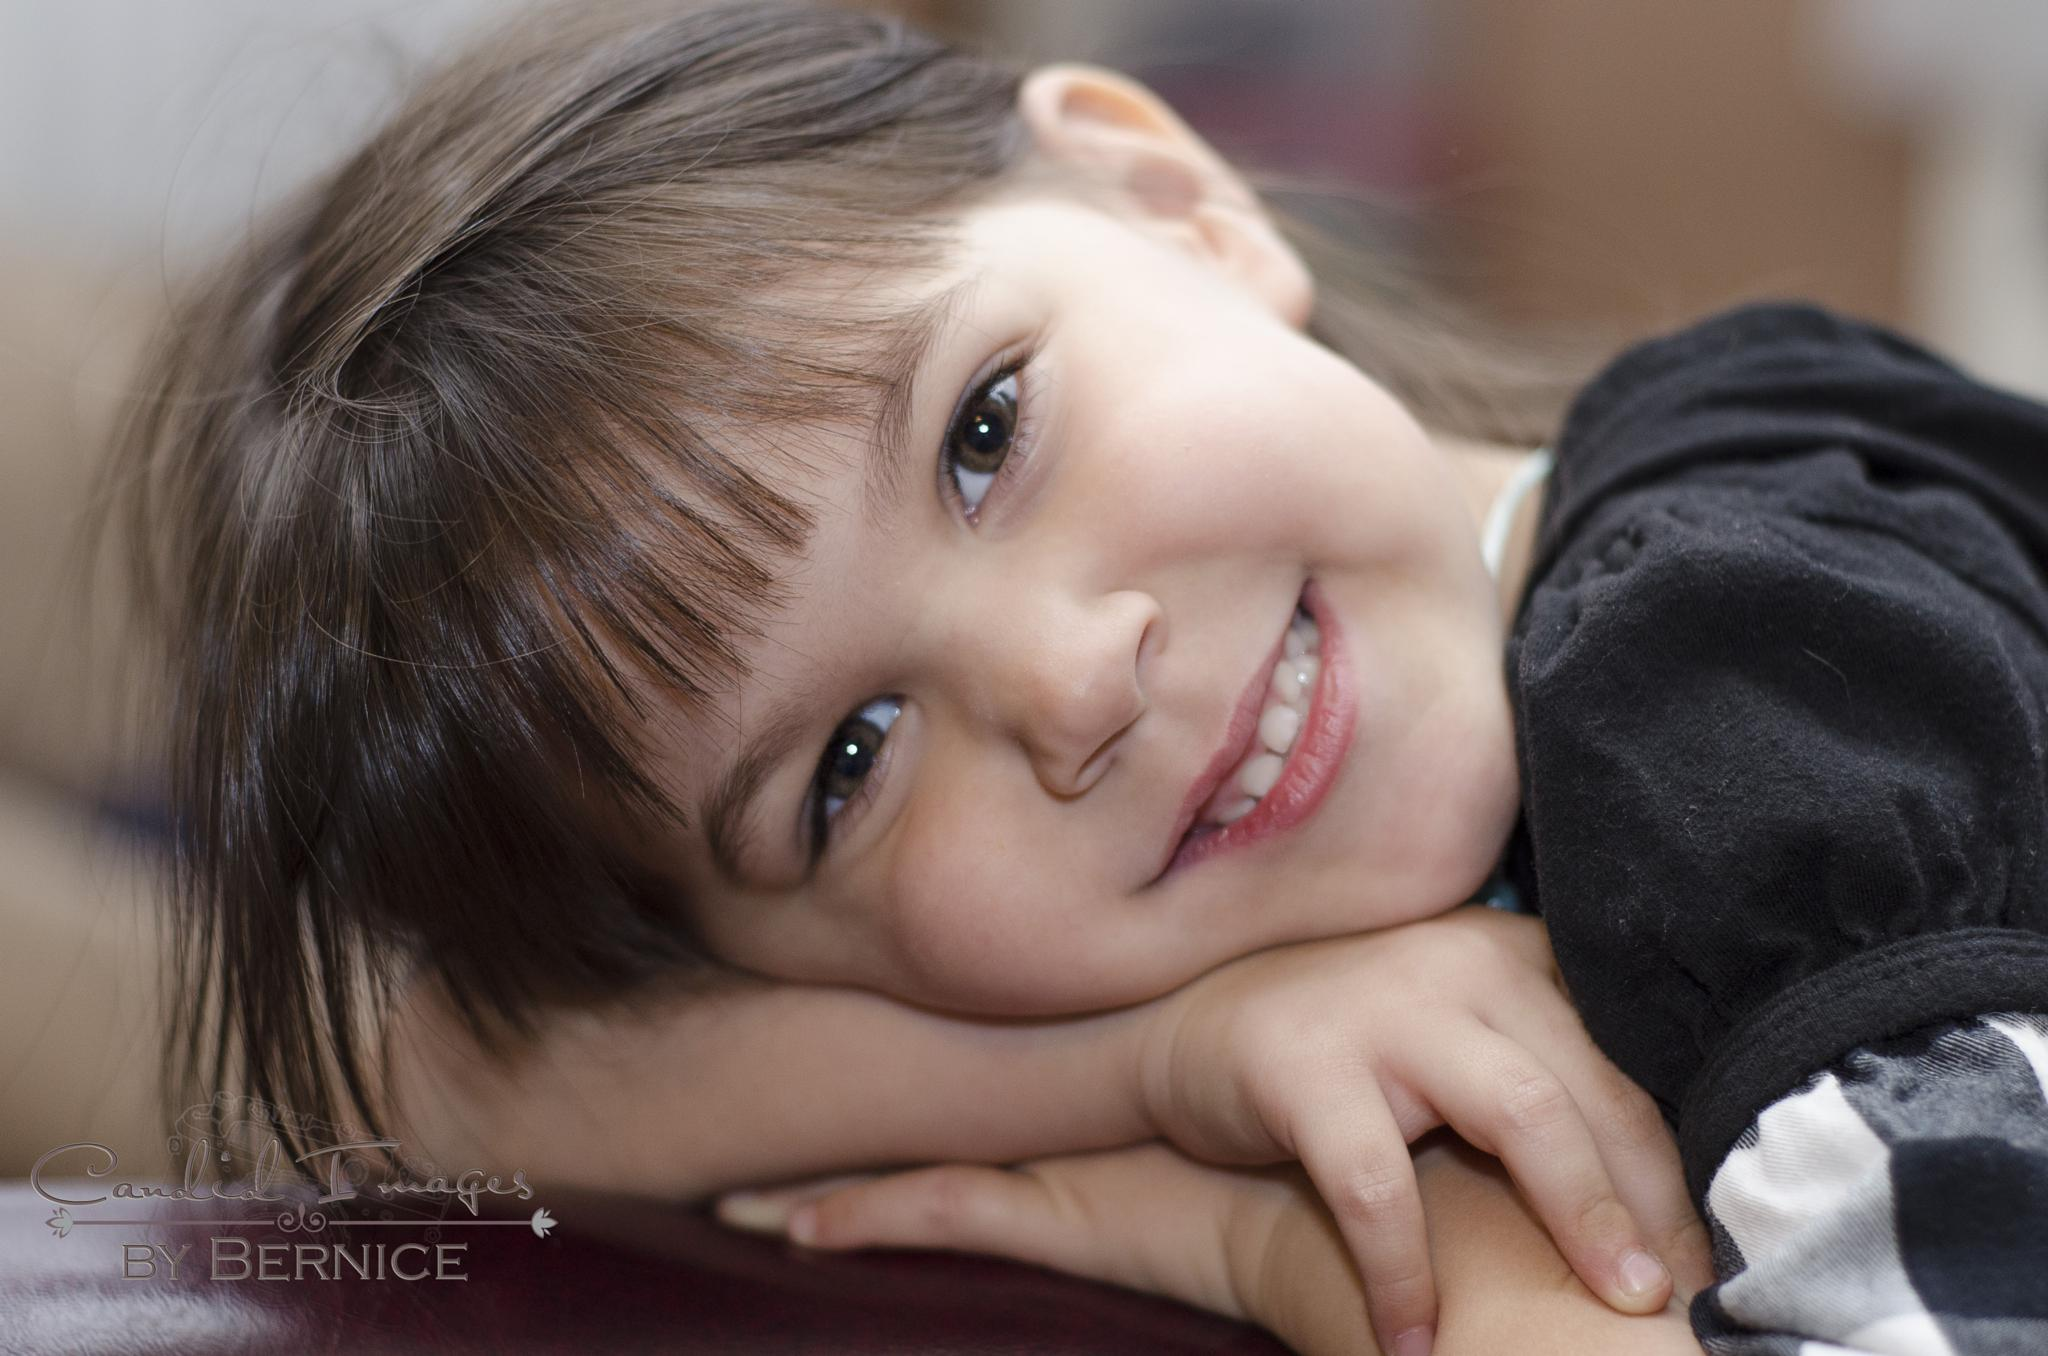 Pretty face by Bernice Thompson